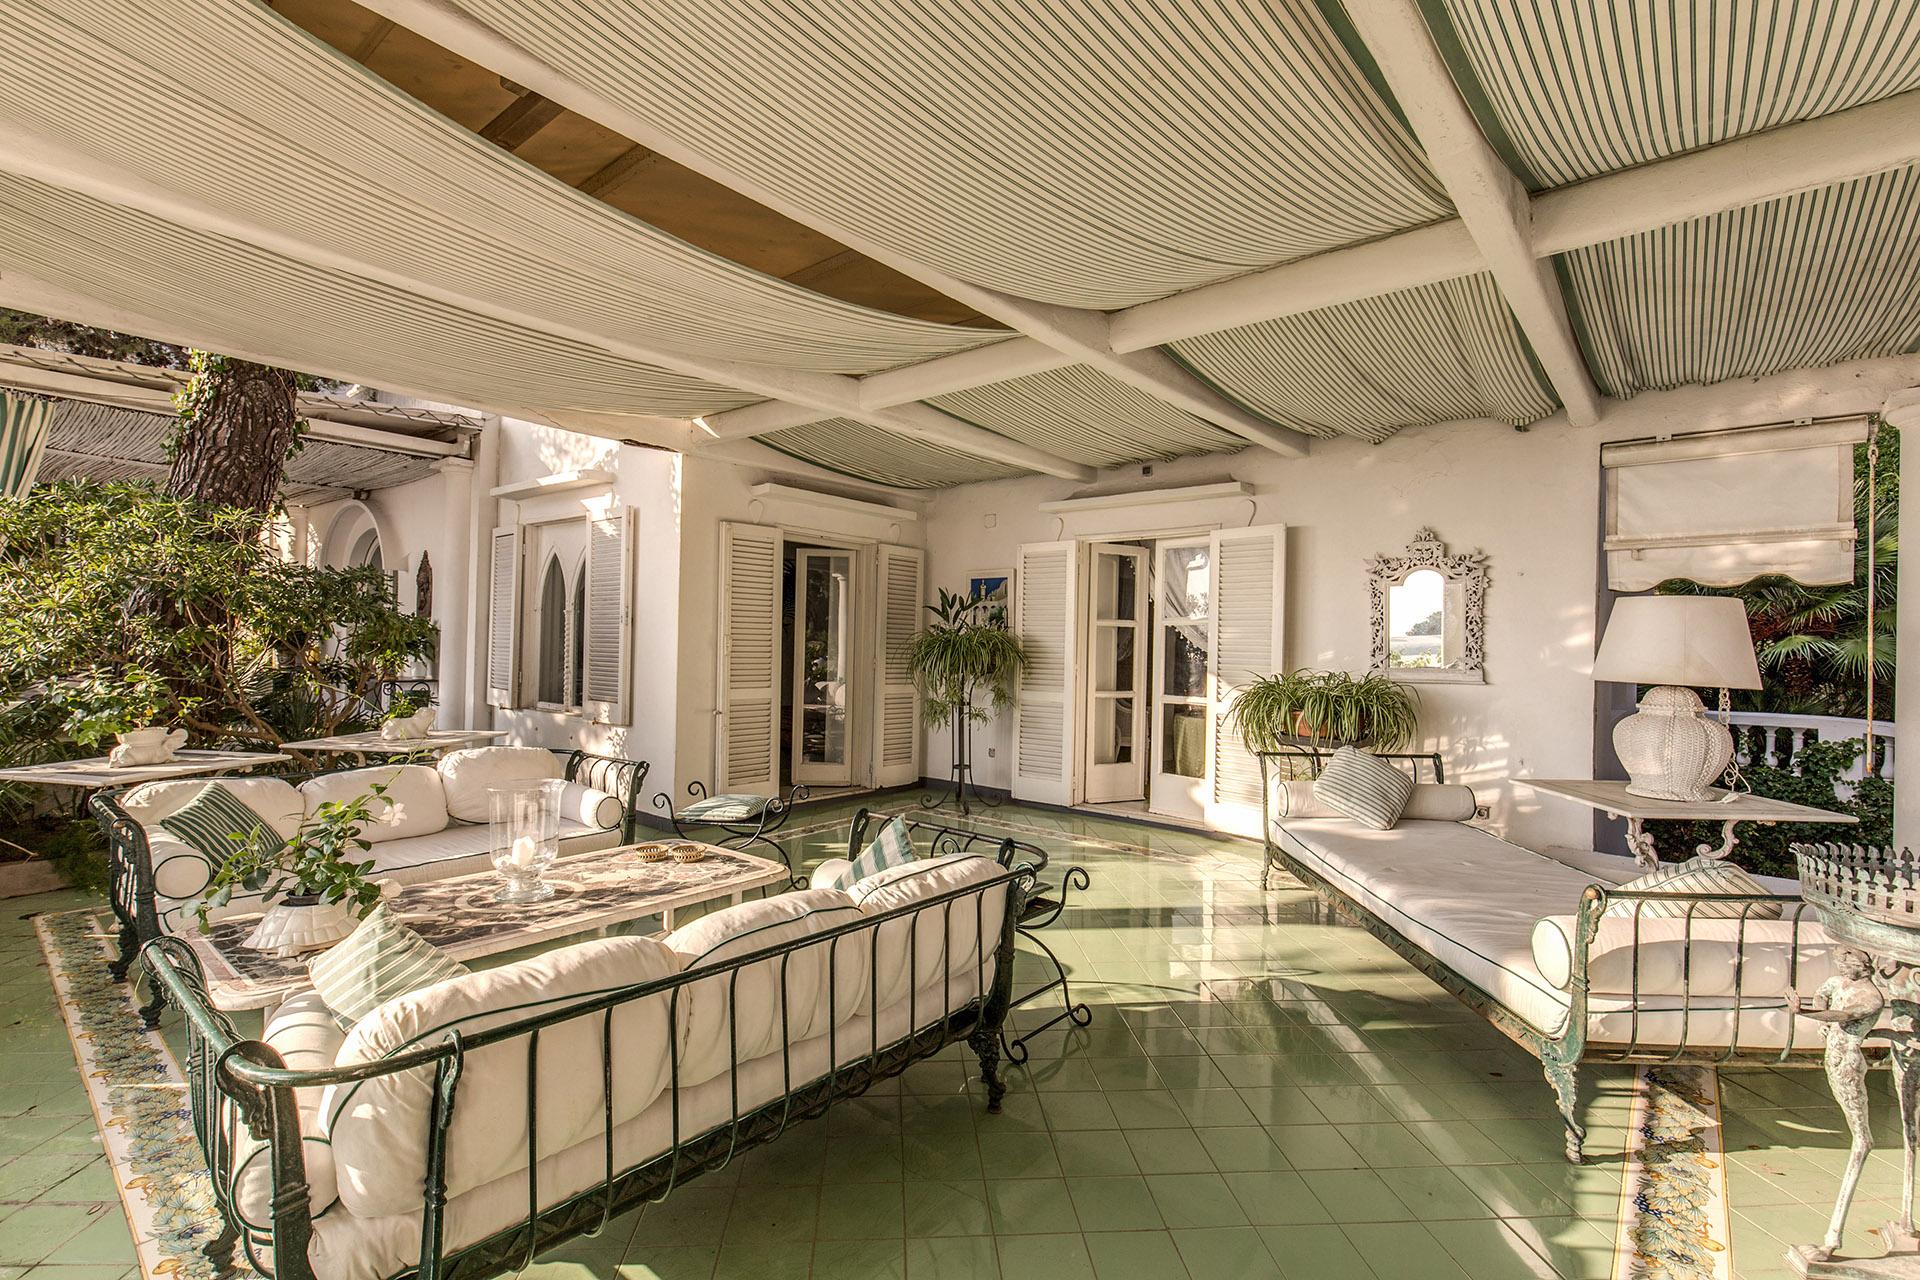 Apartment Green Coral -  Luxury 1950 s Villa photo 18169472